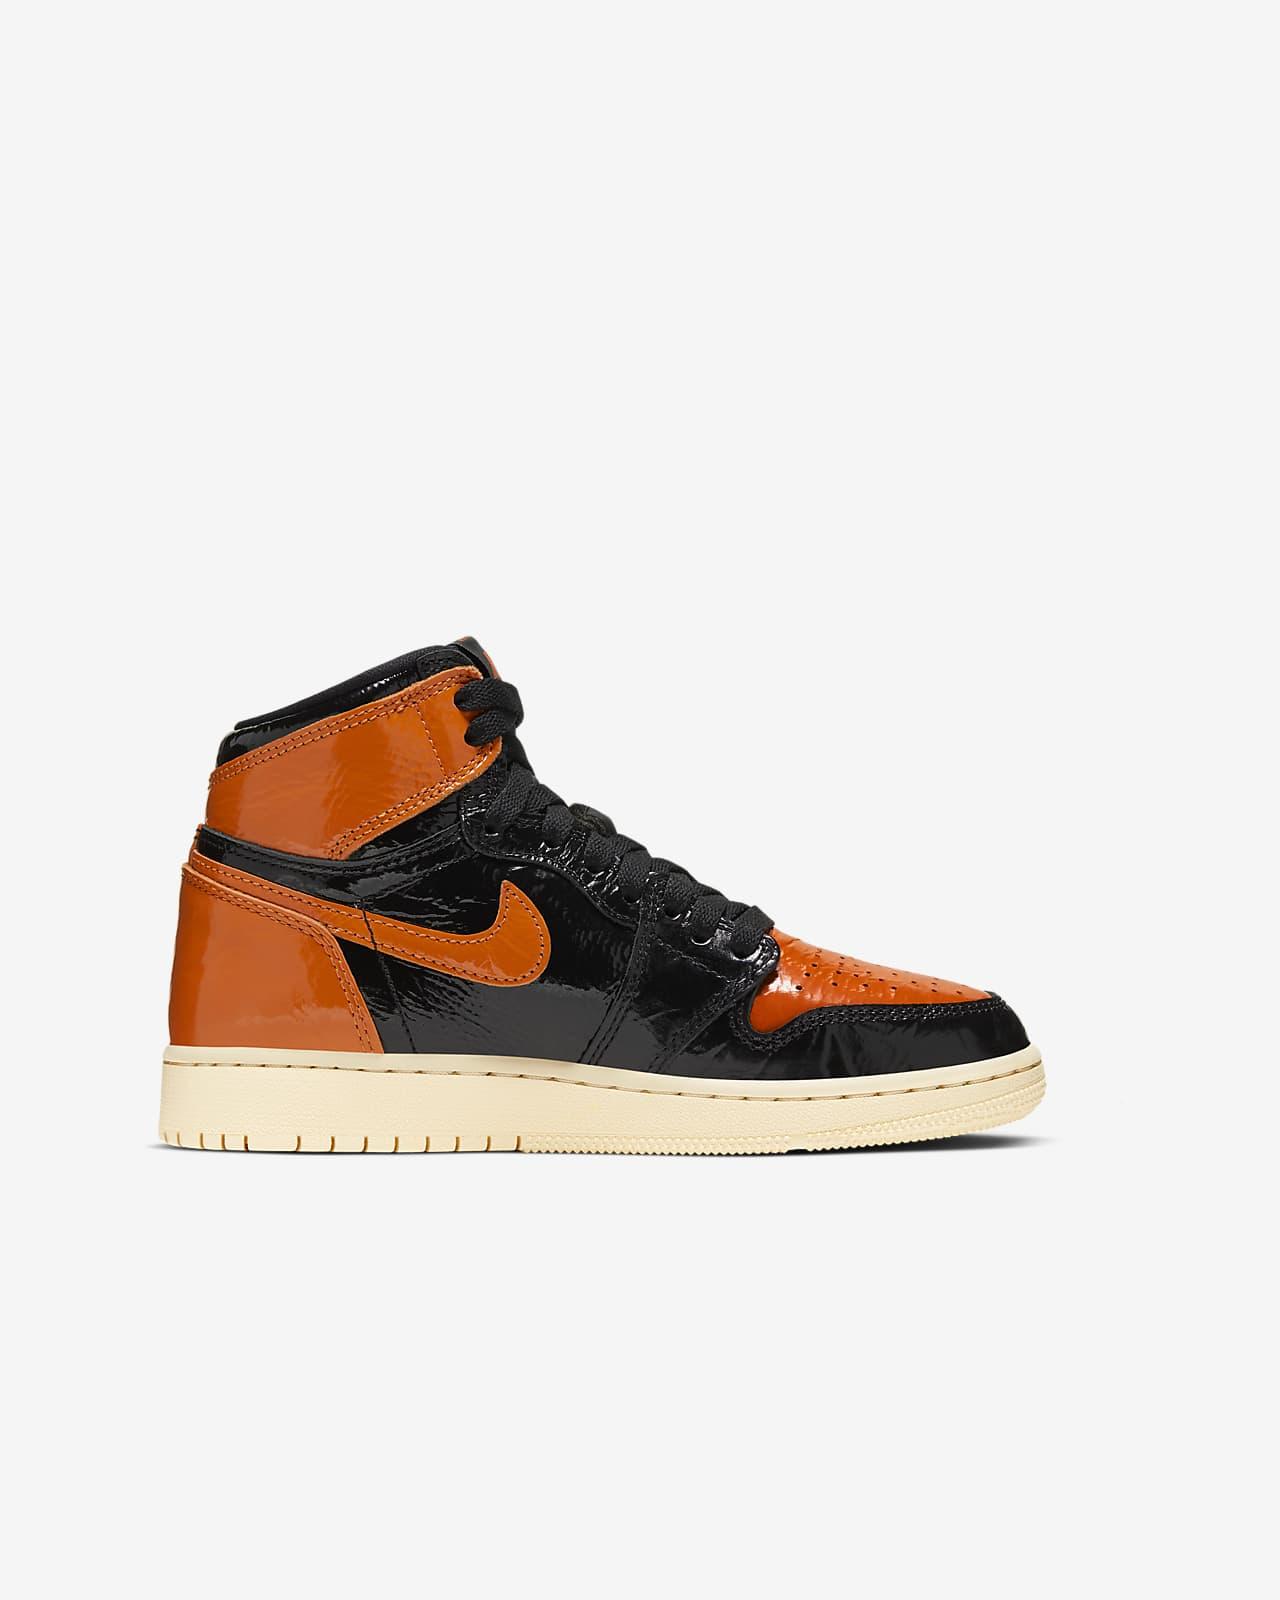 Air Jordan 1 Retro High OG Boys' Shoe